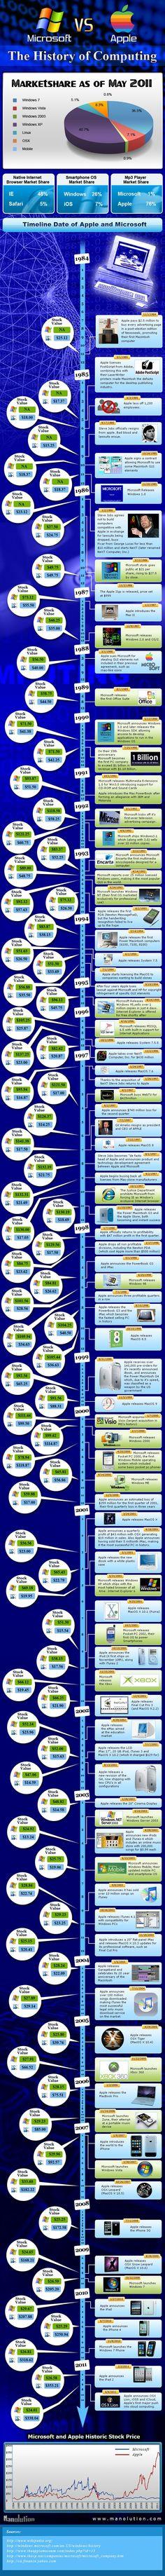 Apple versus Microsoft